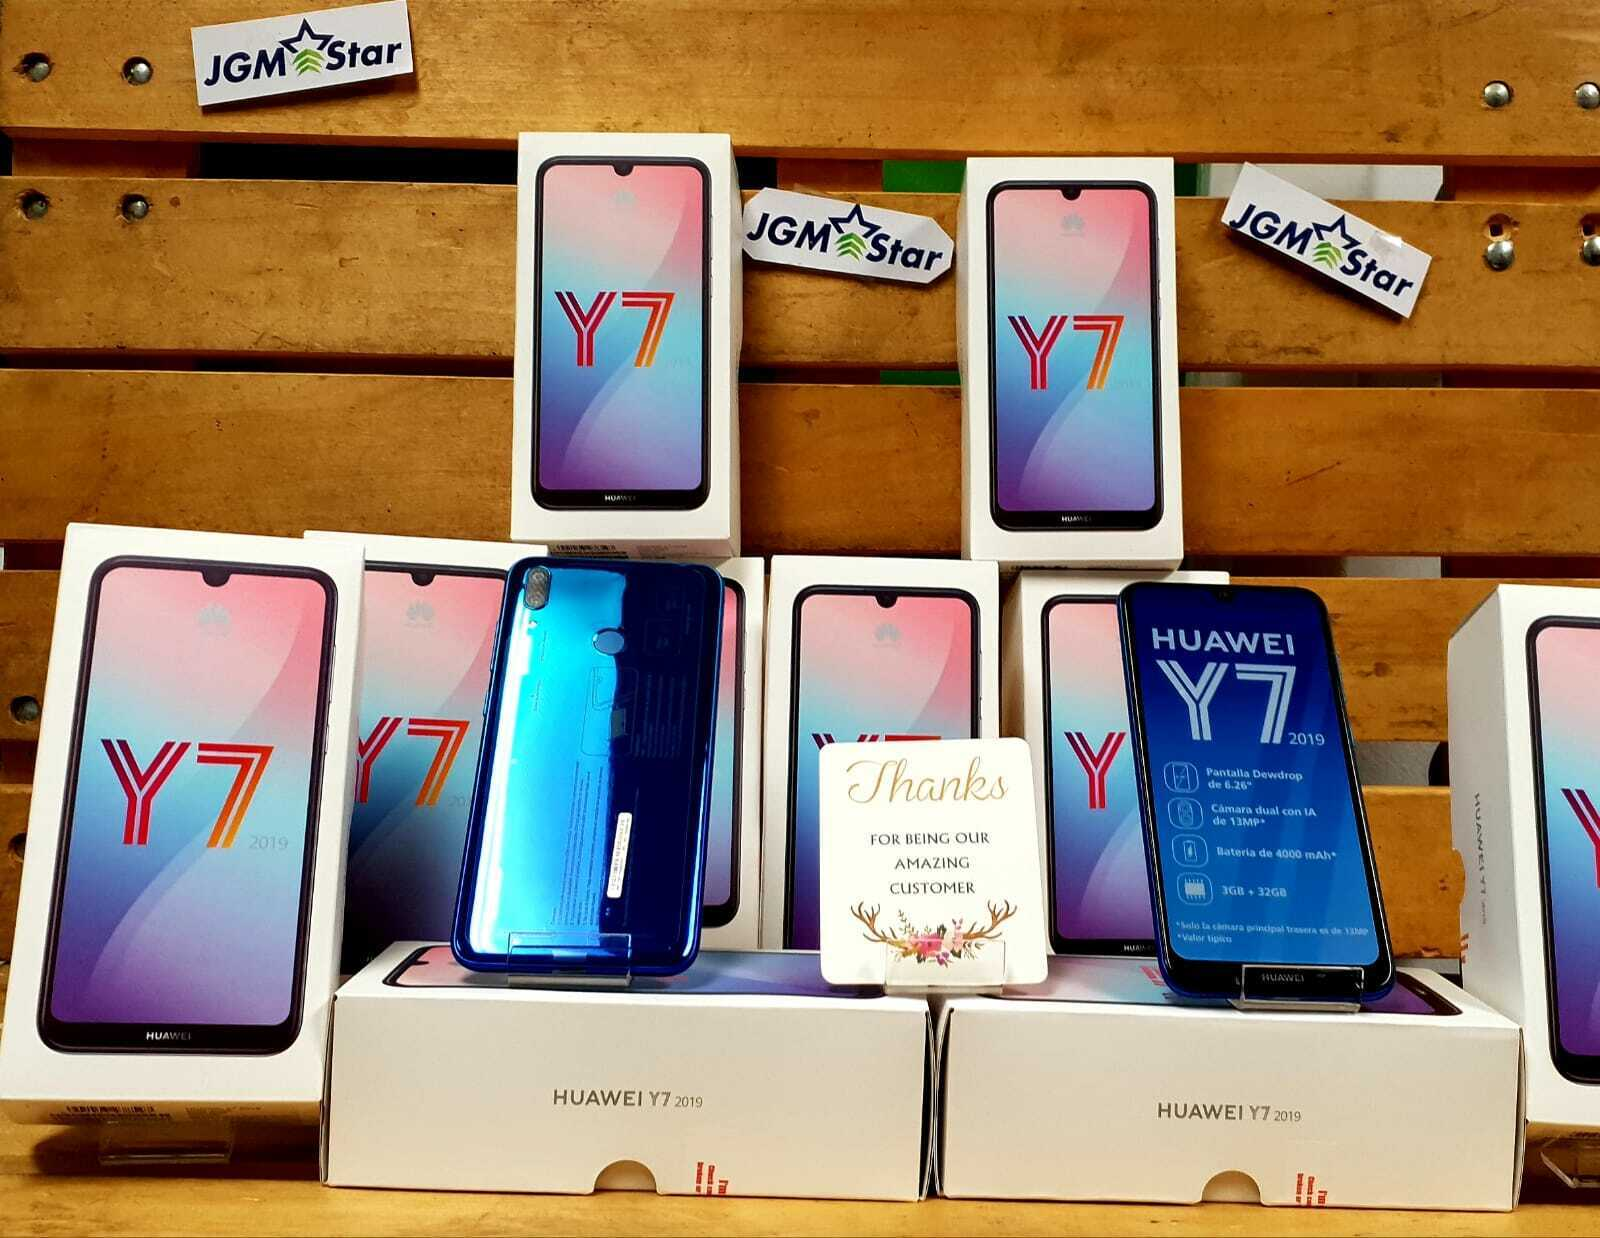 HUAWEI Y7 2019 BLUE 32 GB FACTORY UNLOCKED 6.26 INCH LCD NEW